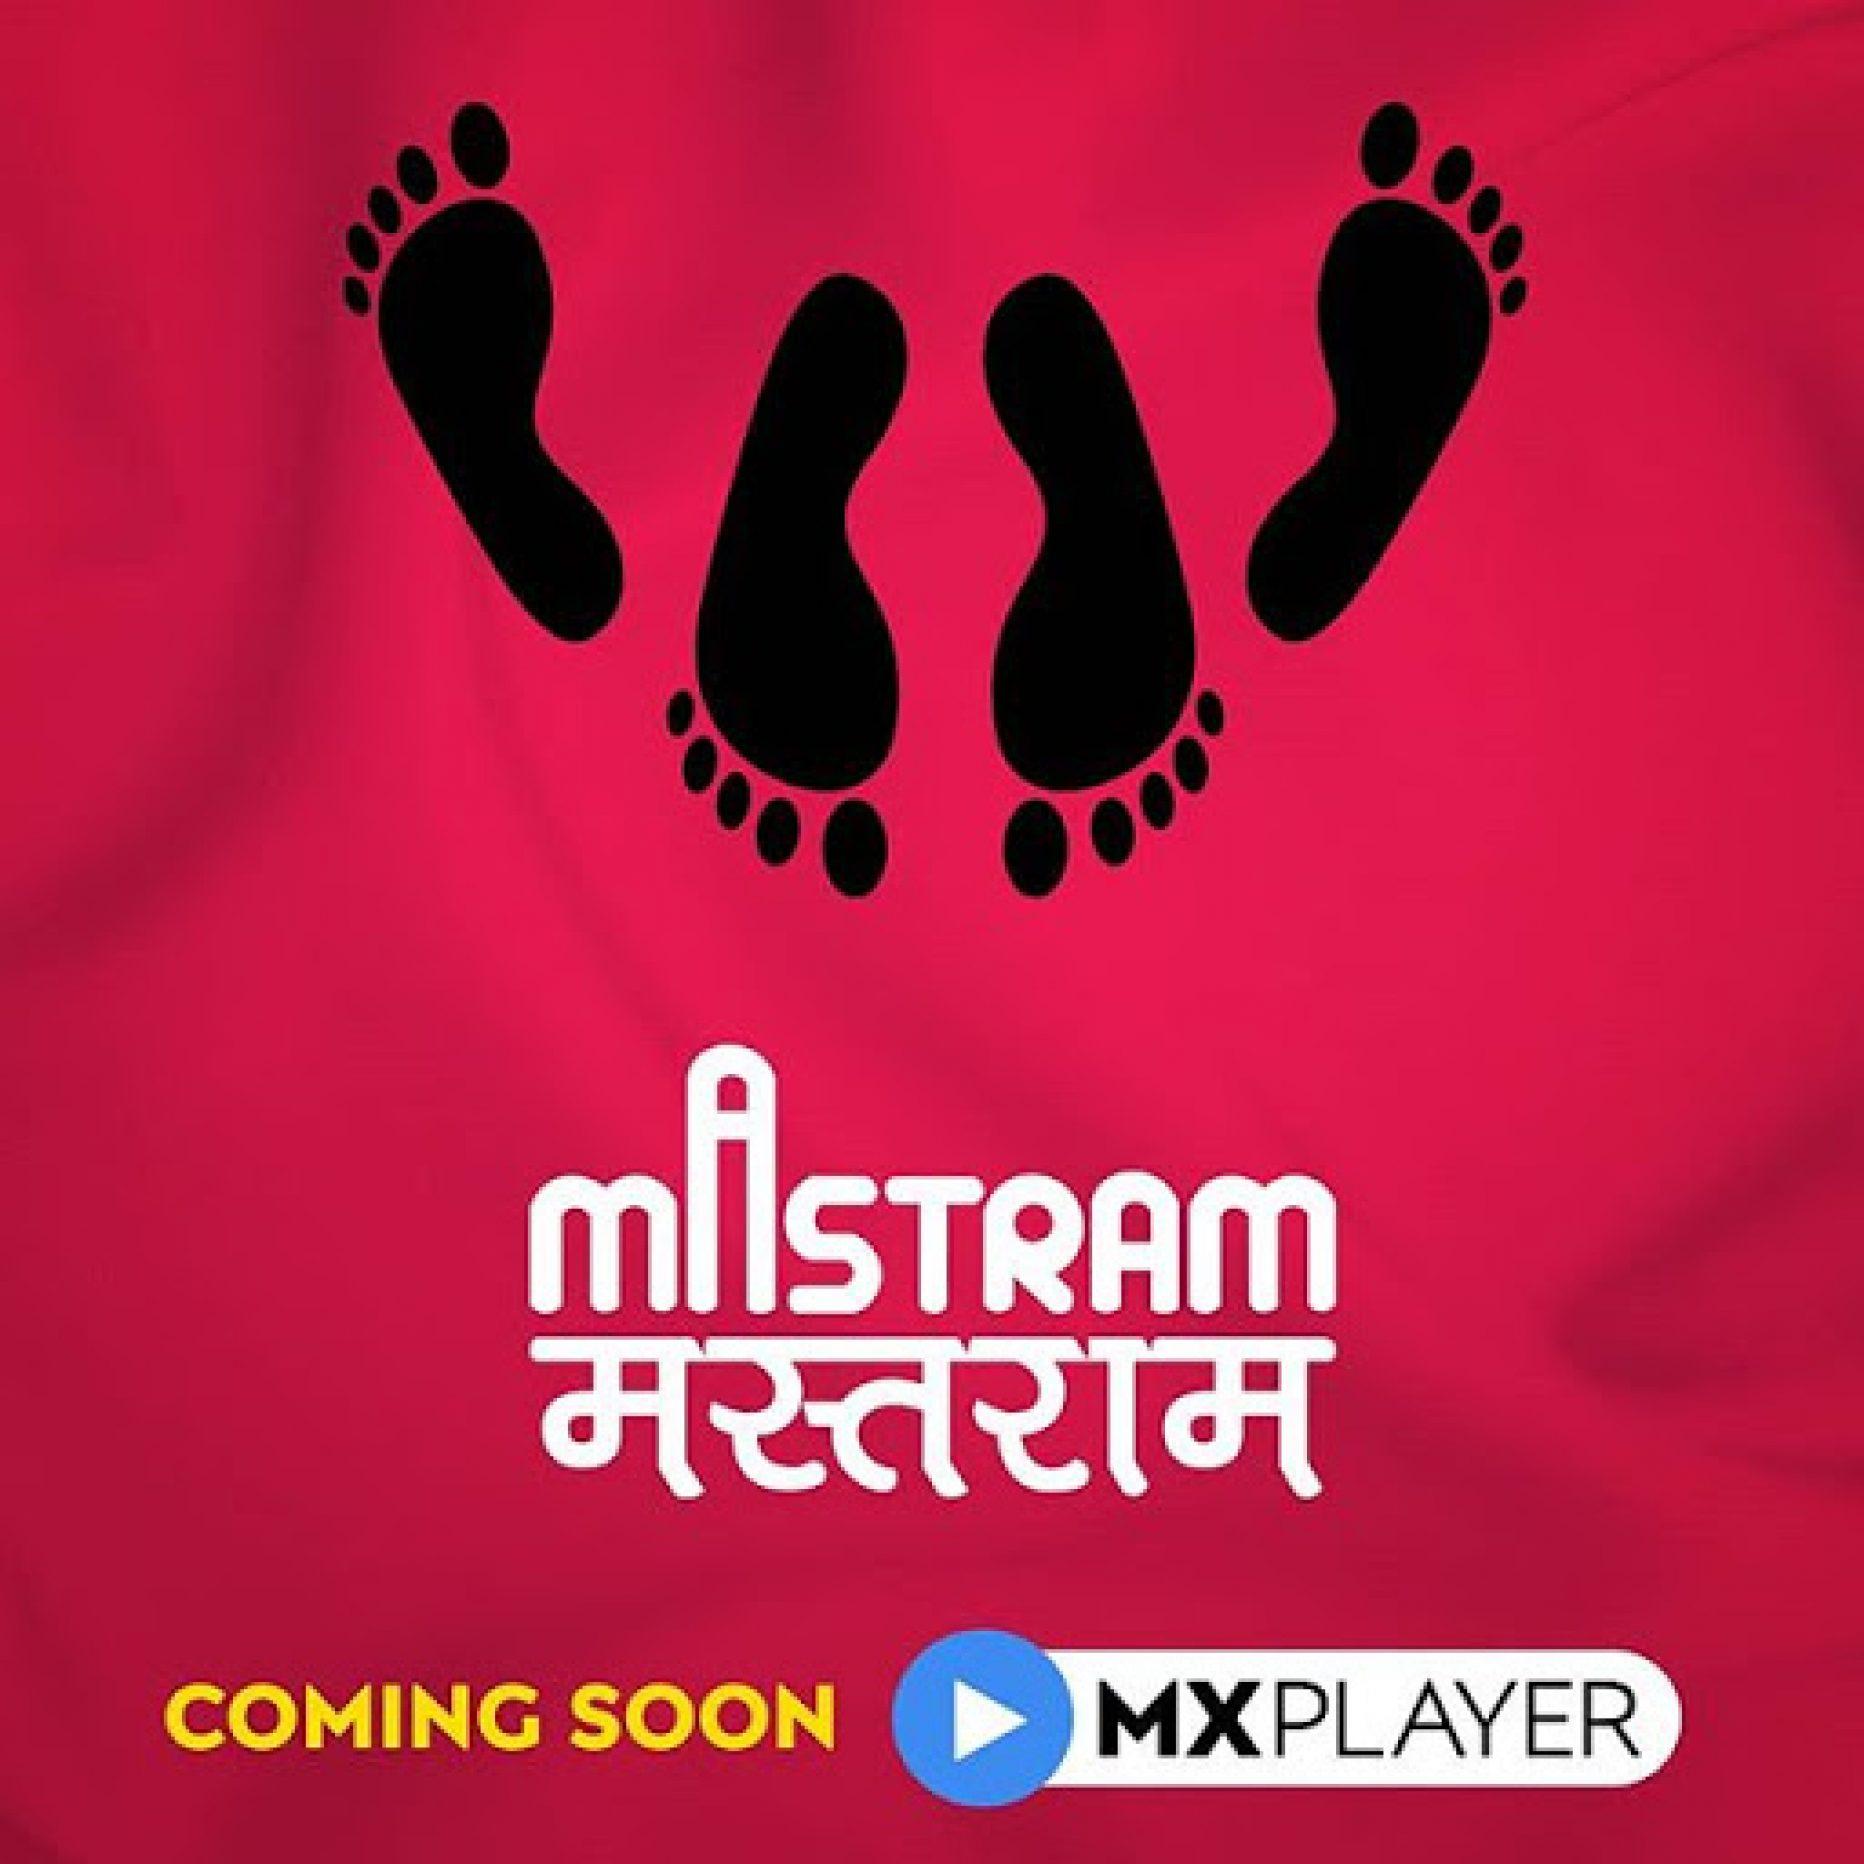 MX Player Mastram Release Date, Cast, Trailer, Plot